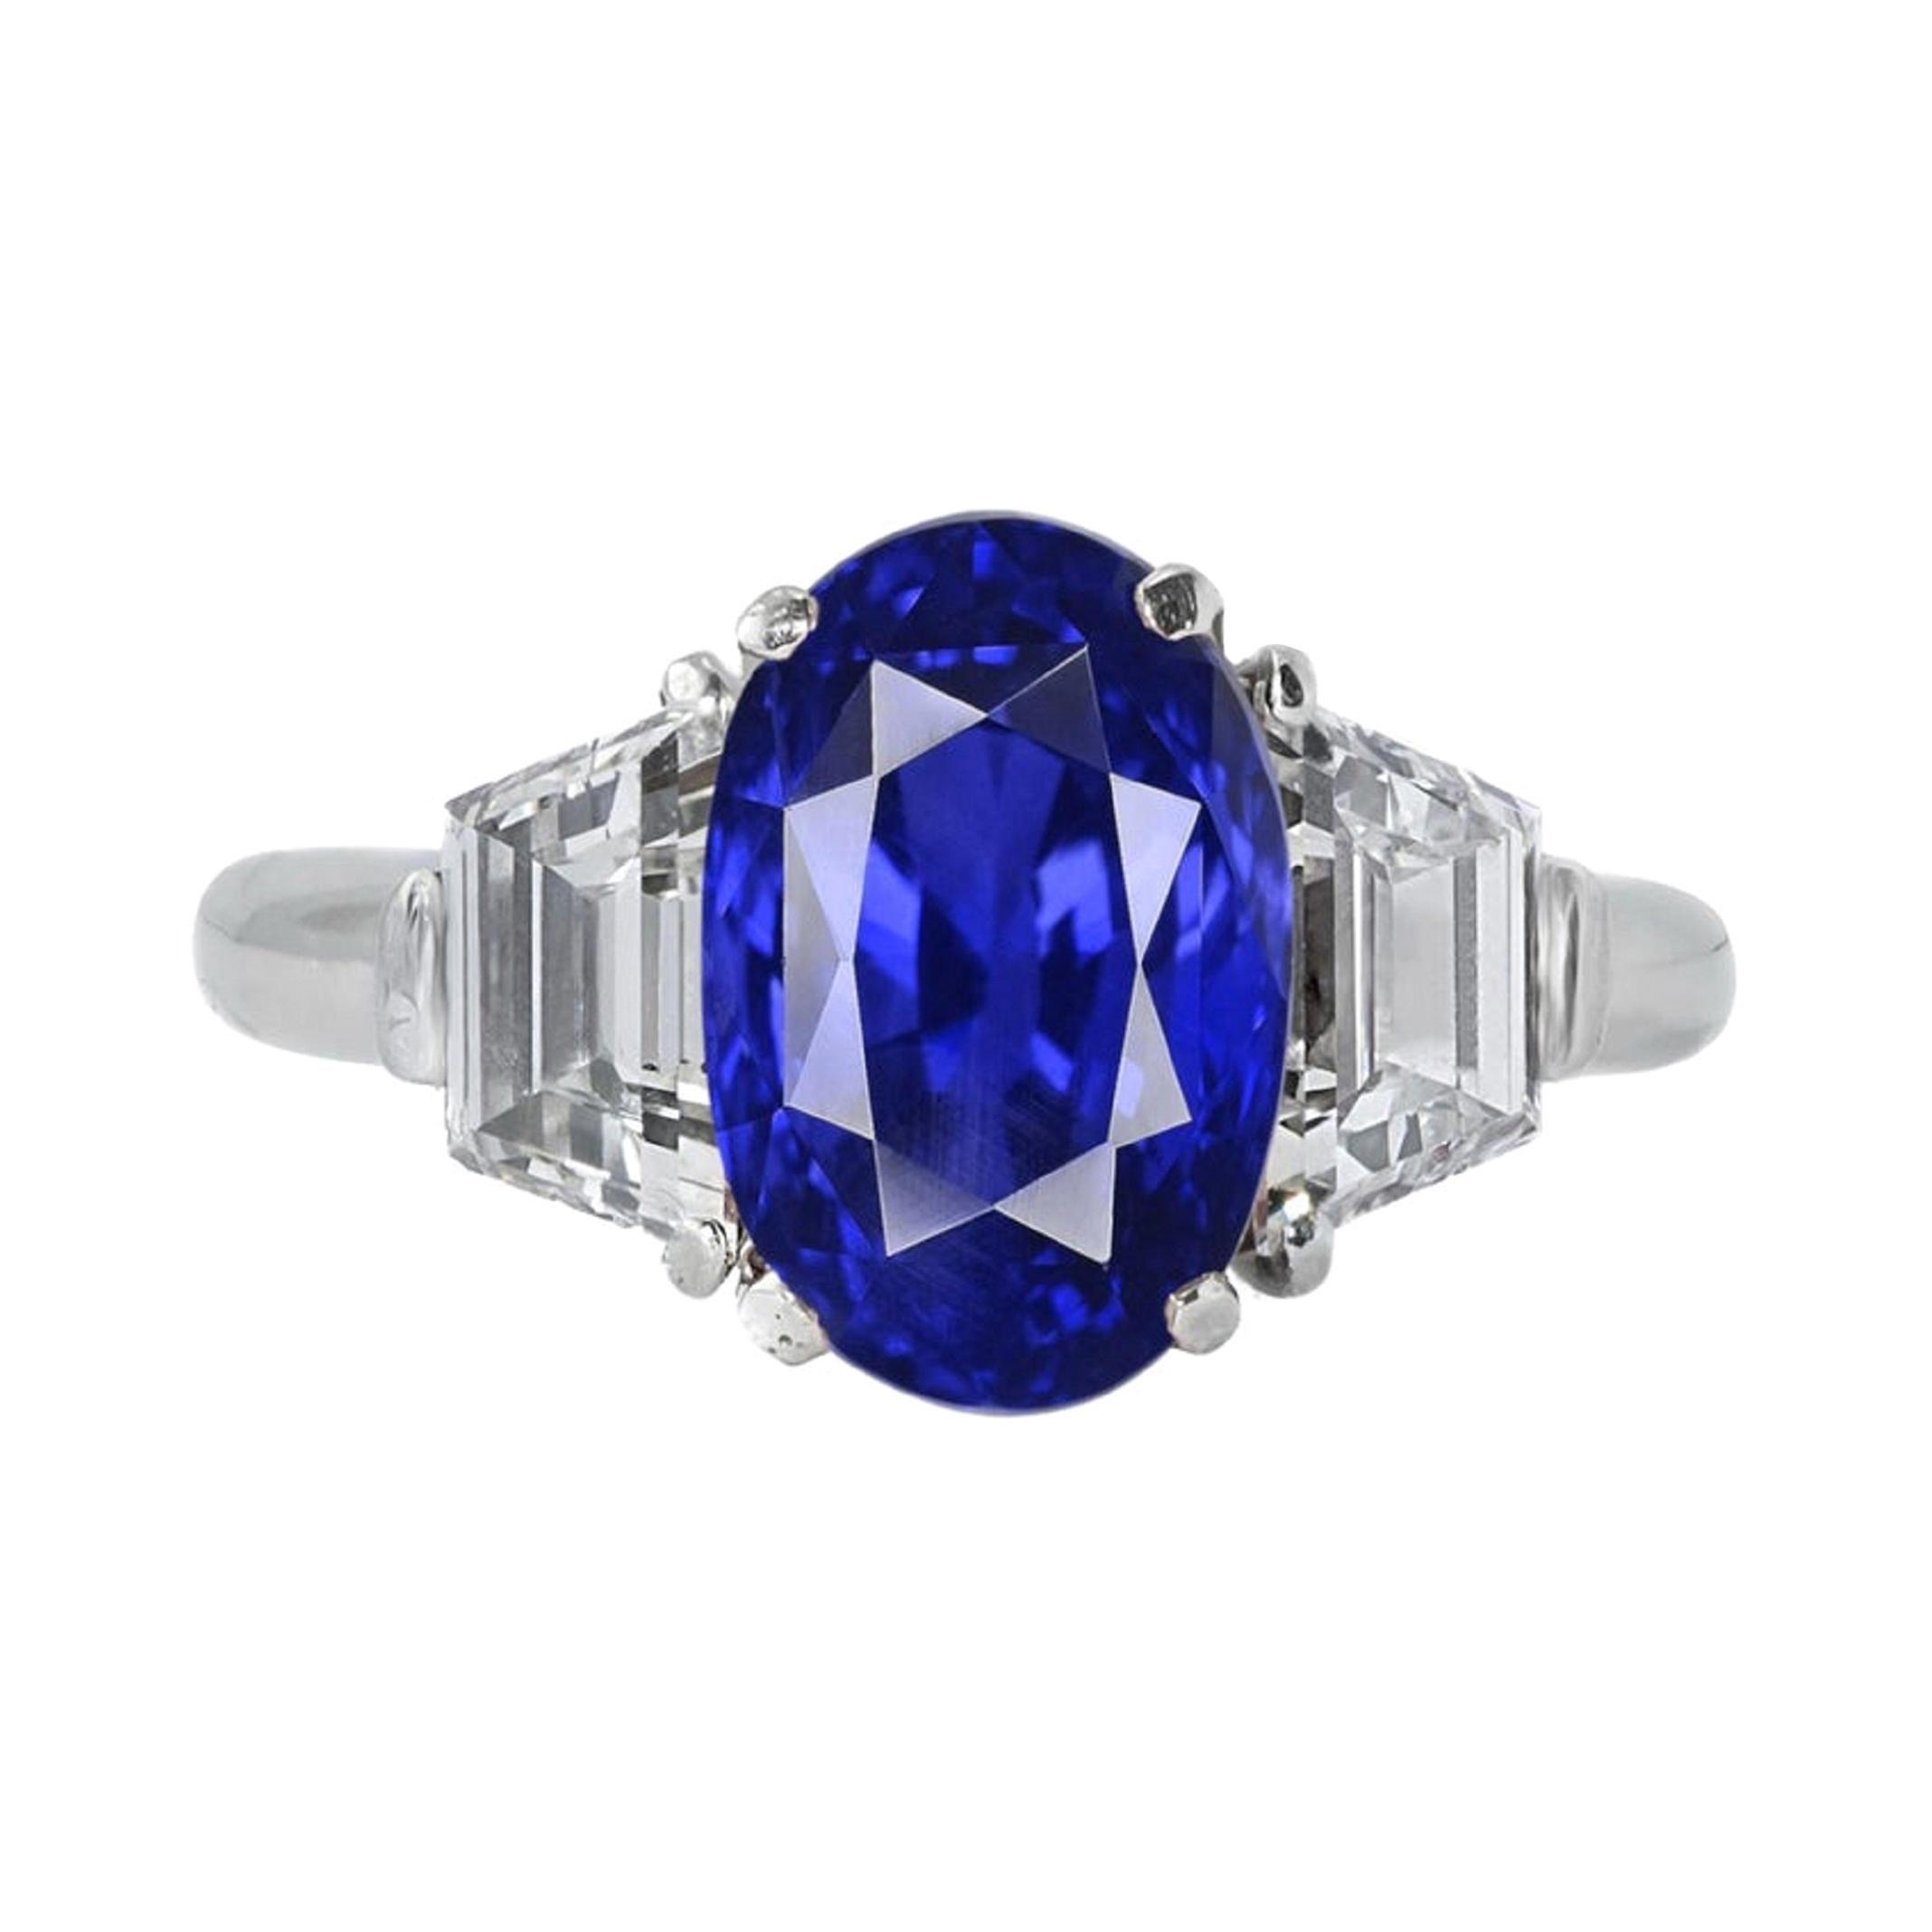 GRS Switzerland 7.12 Carat Unheated Ceylon Oval Royal Vivid Blue Sapphire Ring